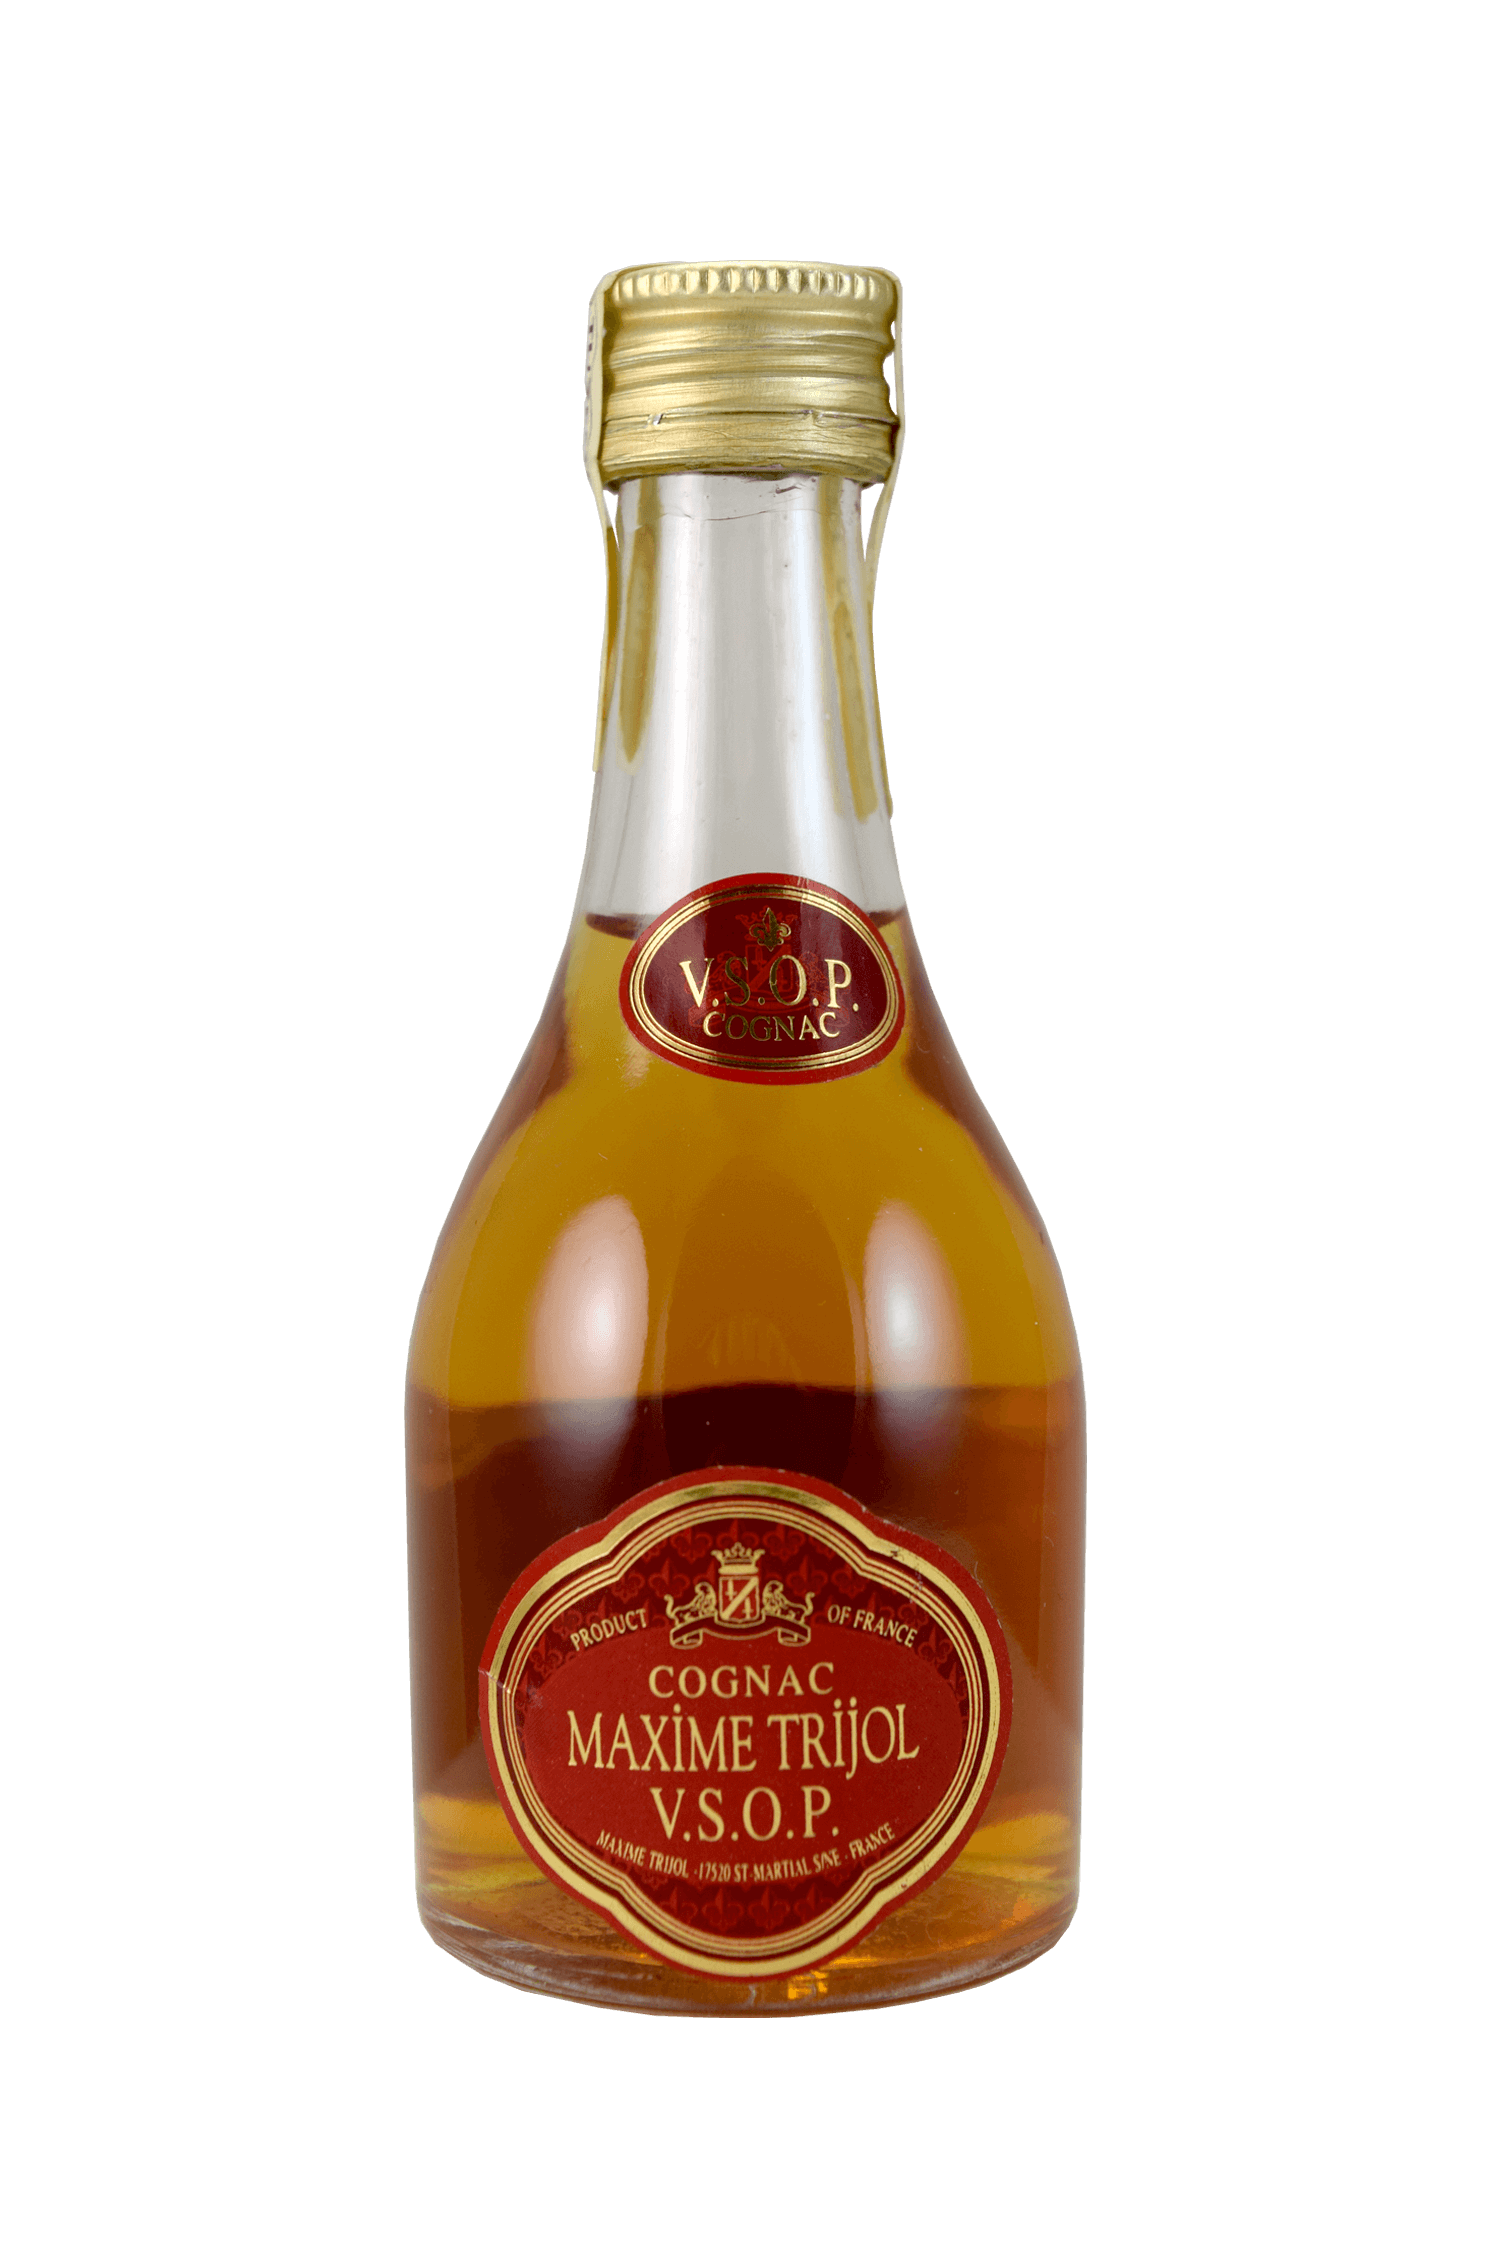 Cognac Maxime Trijol V.S.O.P.